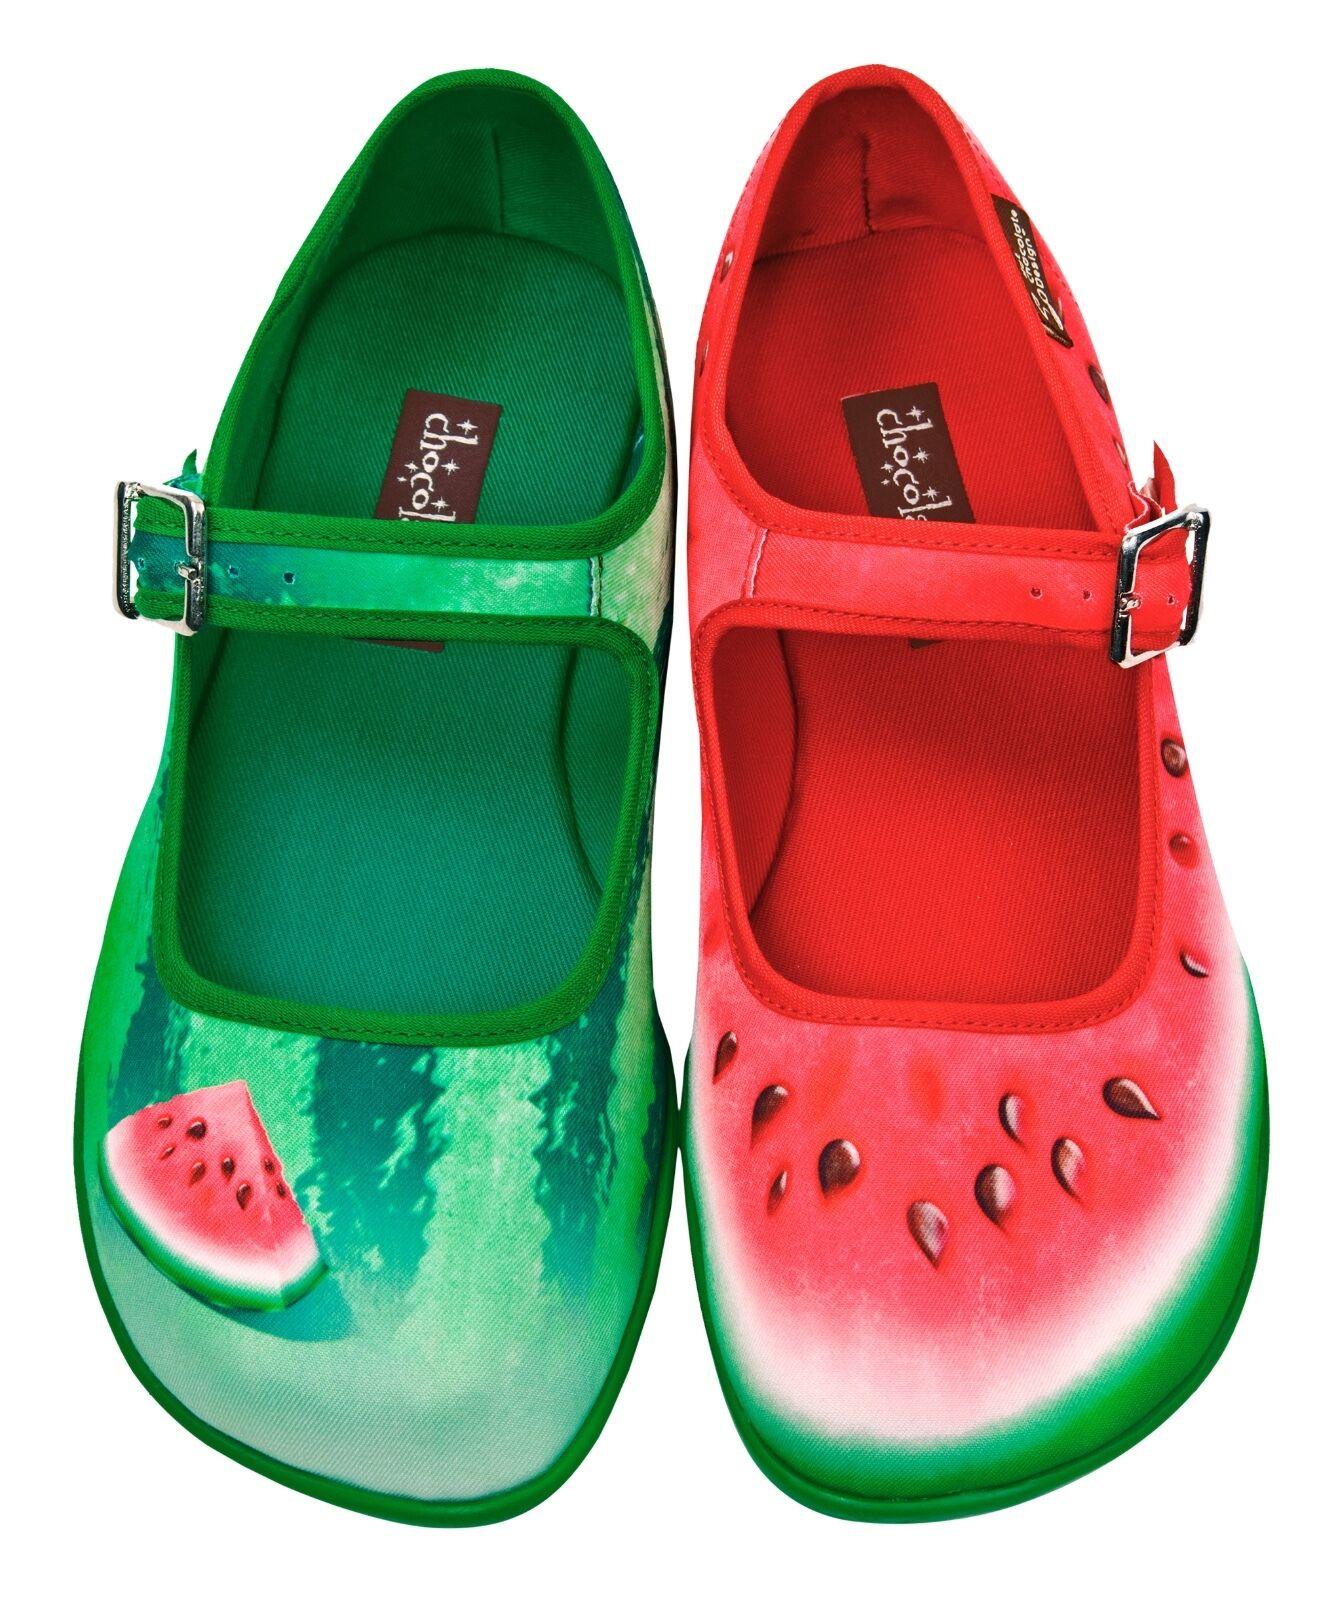 Hot Watermelon. Chocolate Design. Chocolaticas Patilla/ Watermelon. Hot US 7. Damens schuhe 7acb71